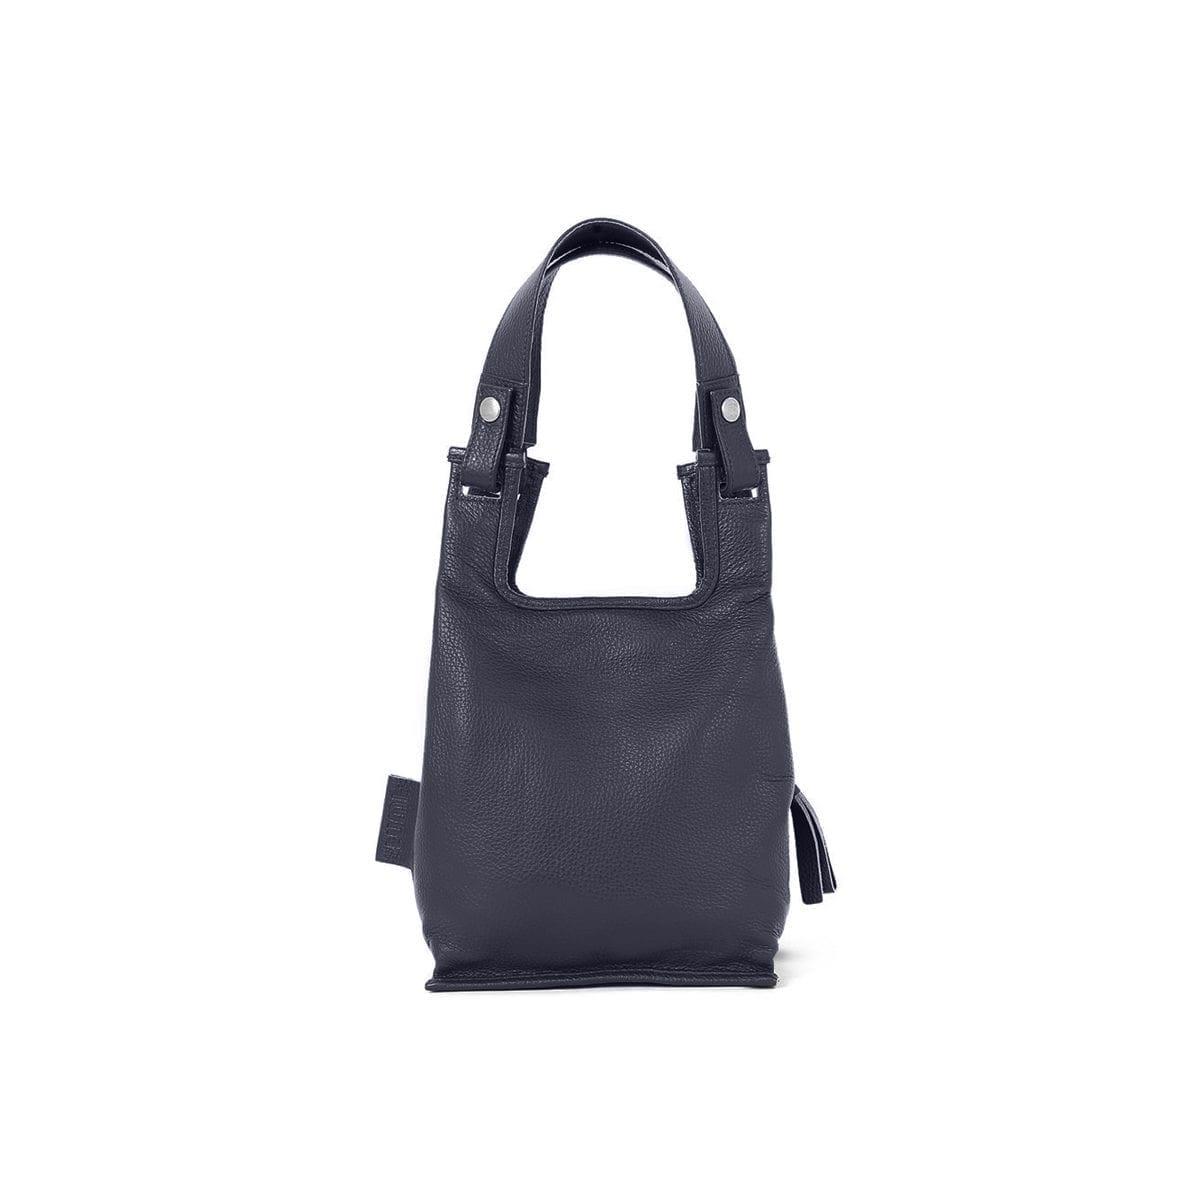 Supermarket Bag XS in navy blue.